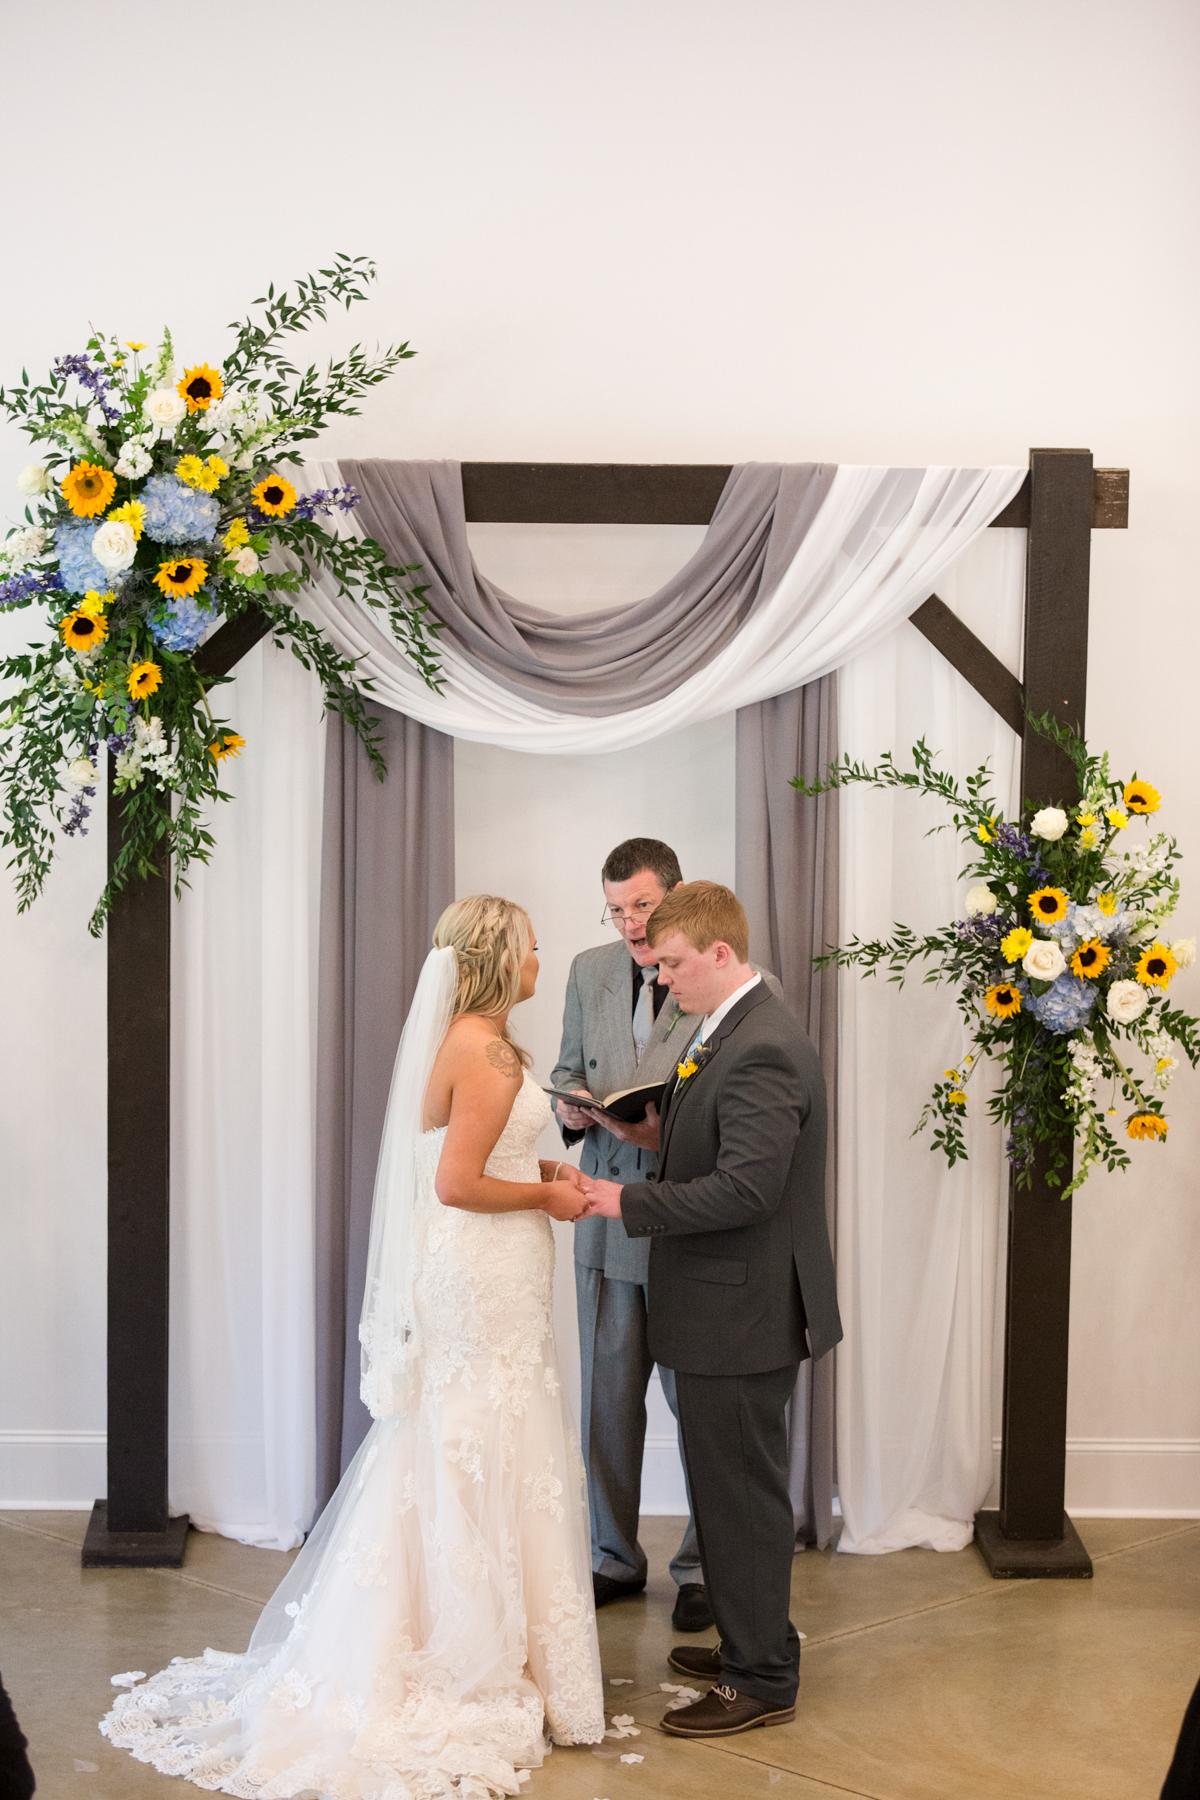 The-venue-at-white-oak-farms-wedding-nashville-wedding-photographers-0165.jpg